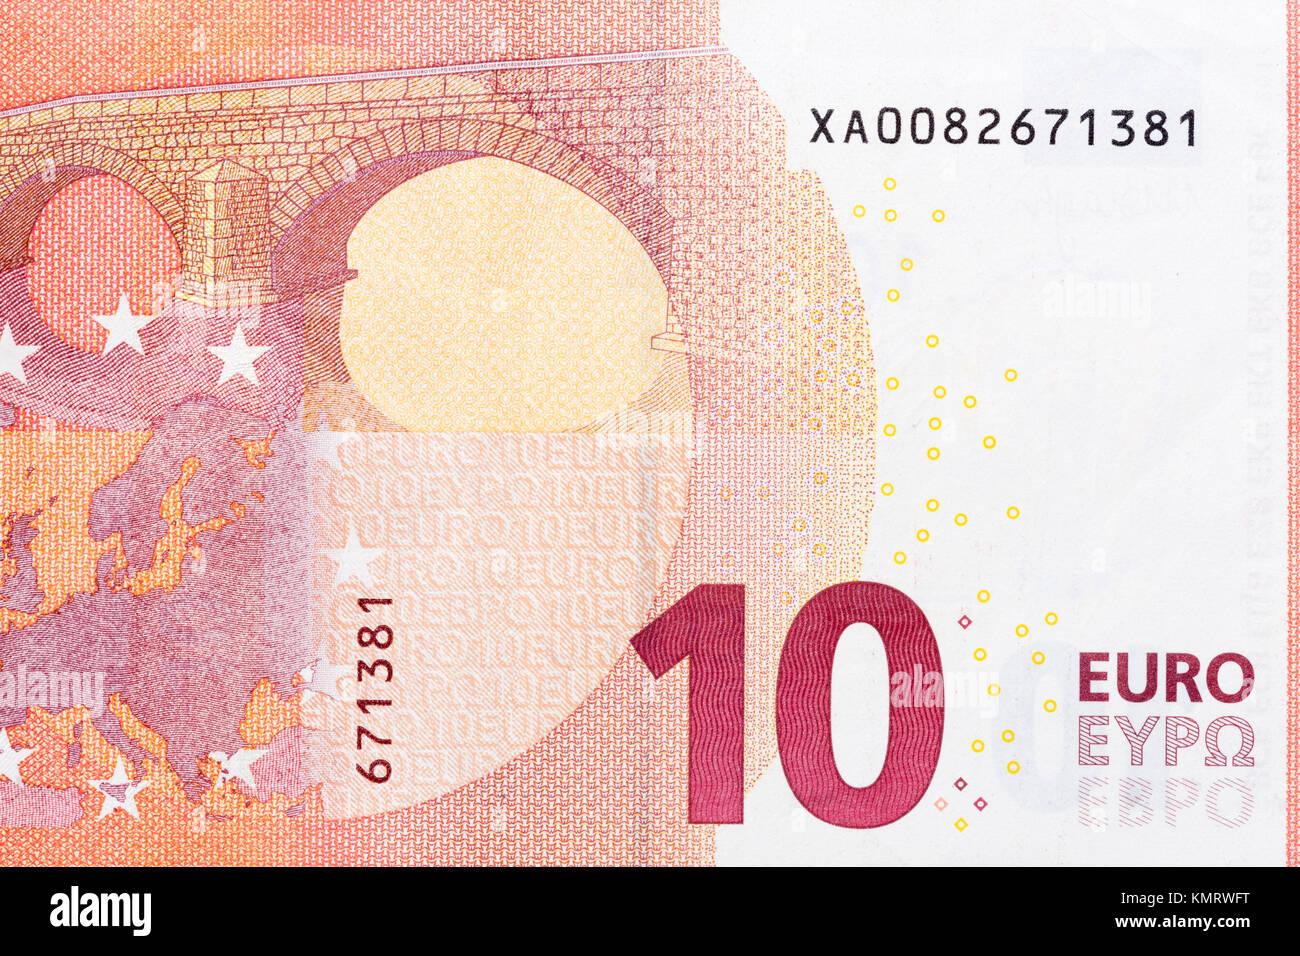 Photo of ten euro banknote in macro. - Stock Image